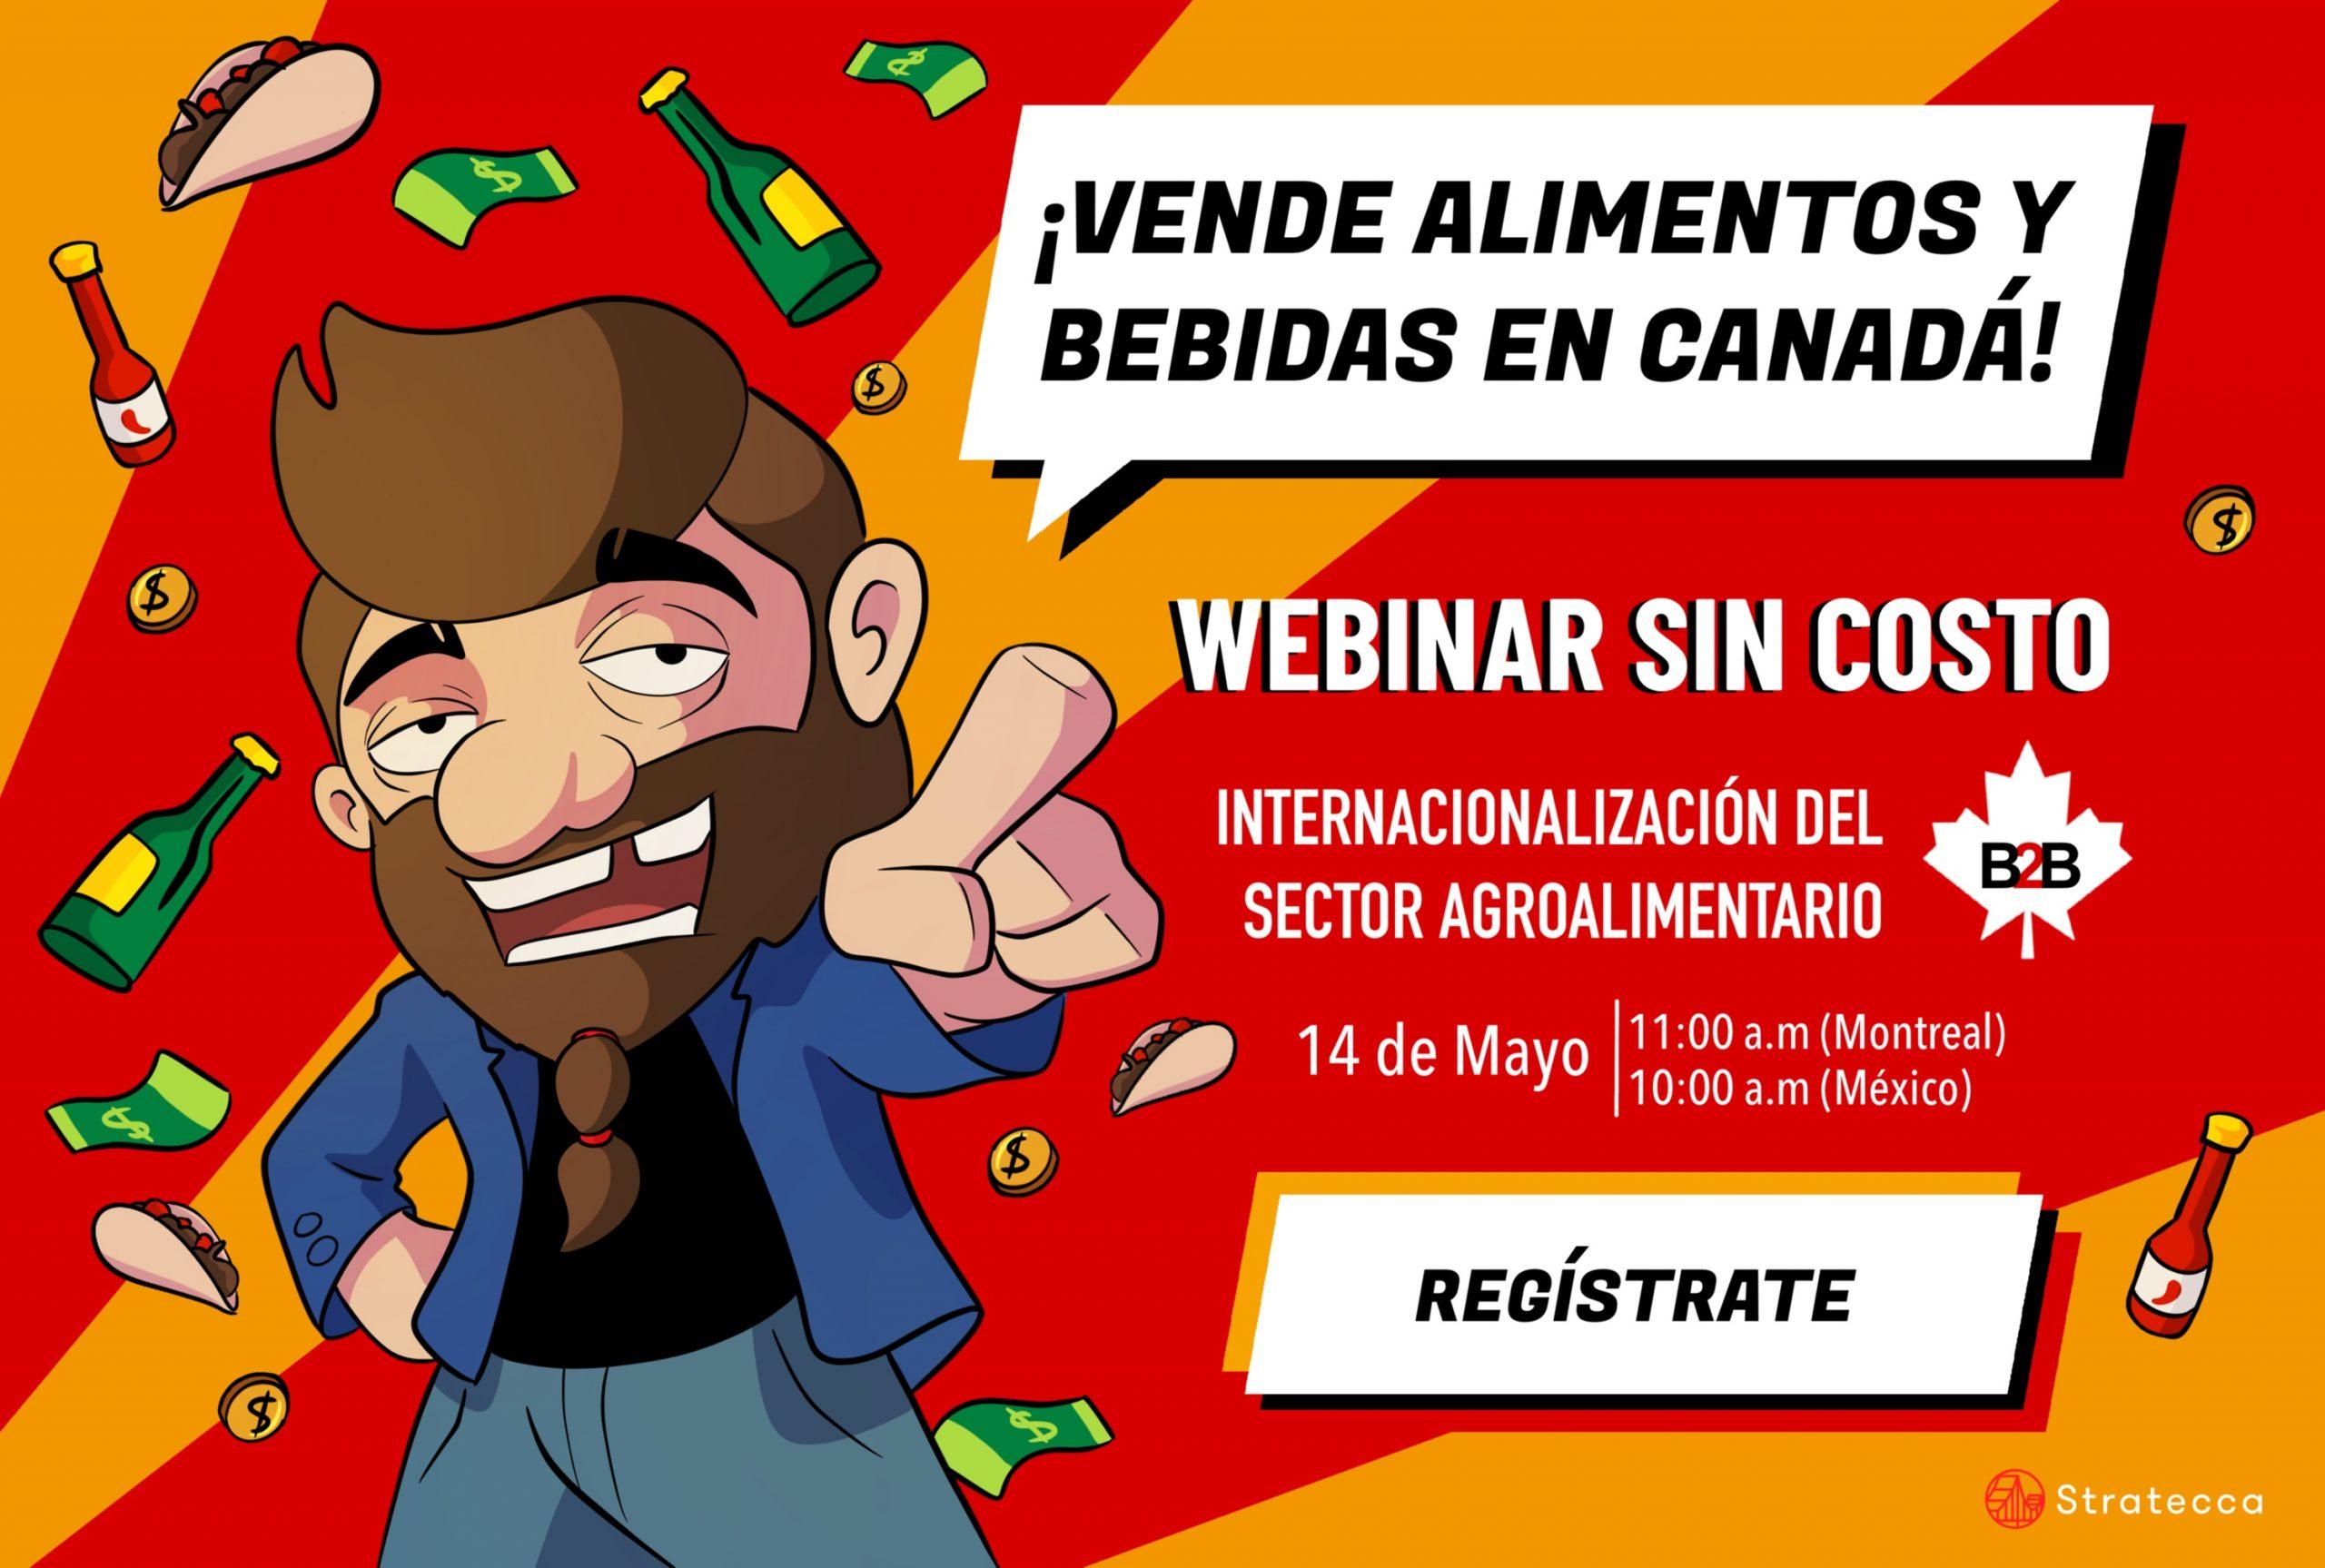 Poster de invitación a Webinar